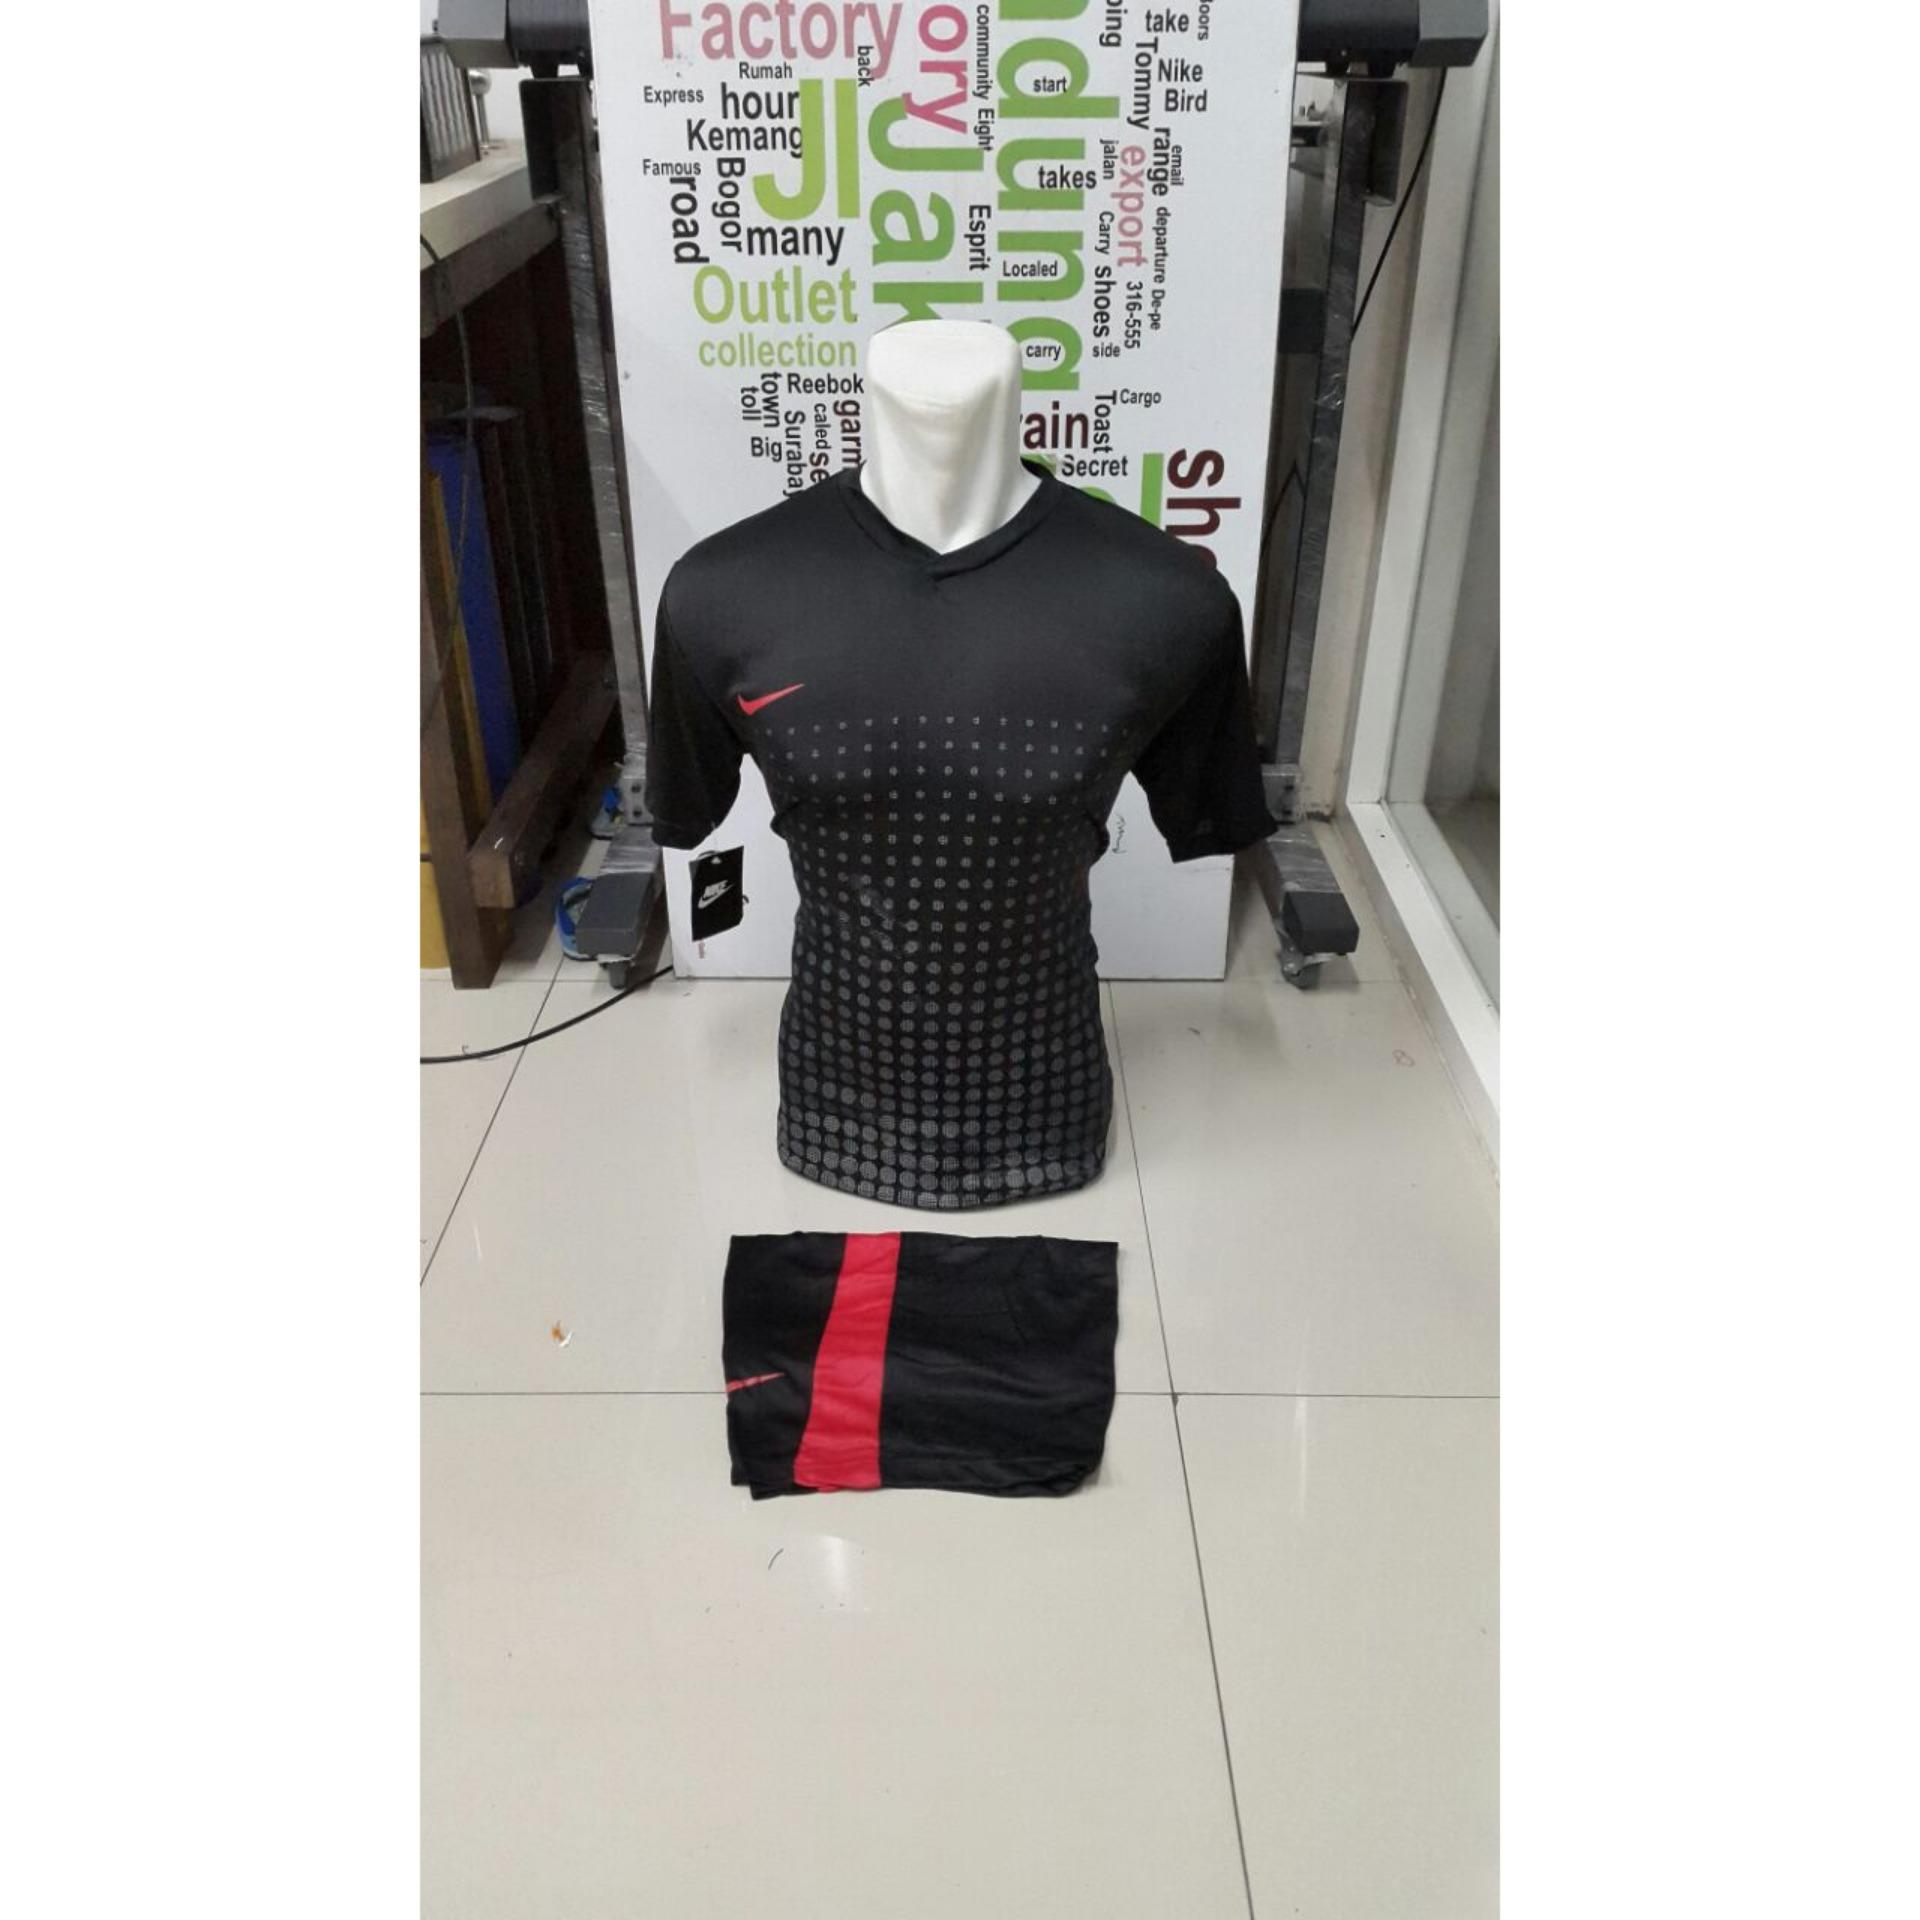 Harga Celana Futsal Nike Hitam Terbaru Murah Bulan November 2018 Adidas Polos Grade Ori Kostum Kaos Sepakbola Volly Takraw M L Xl Plus Pendek 236